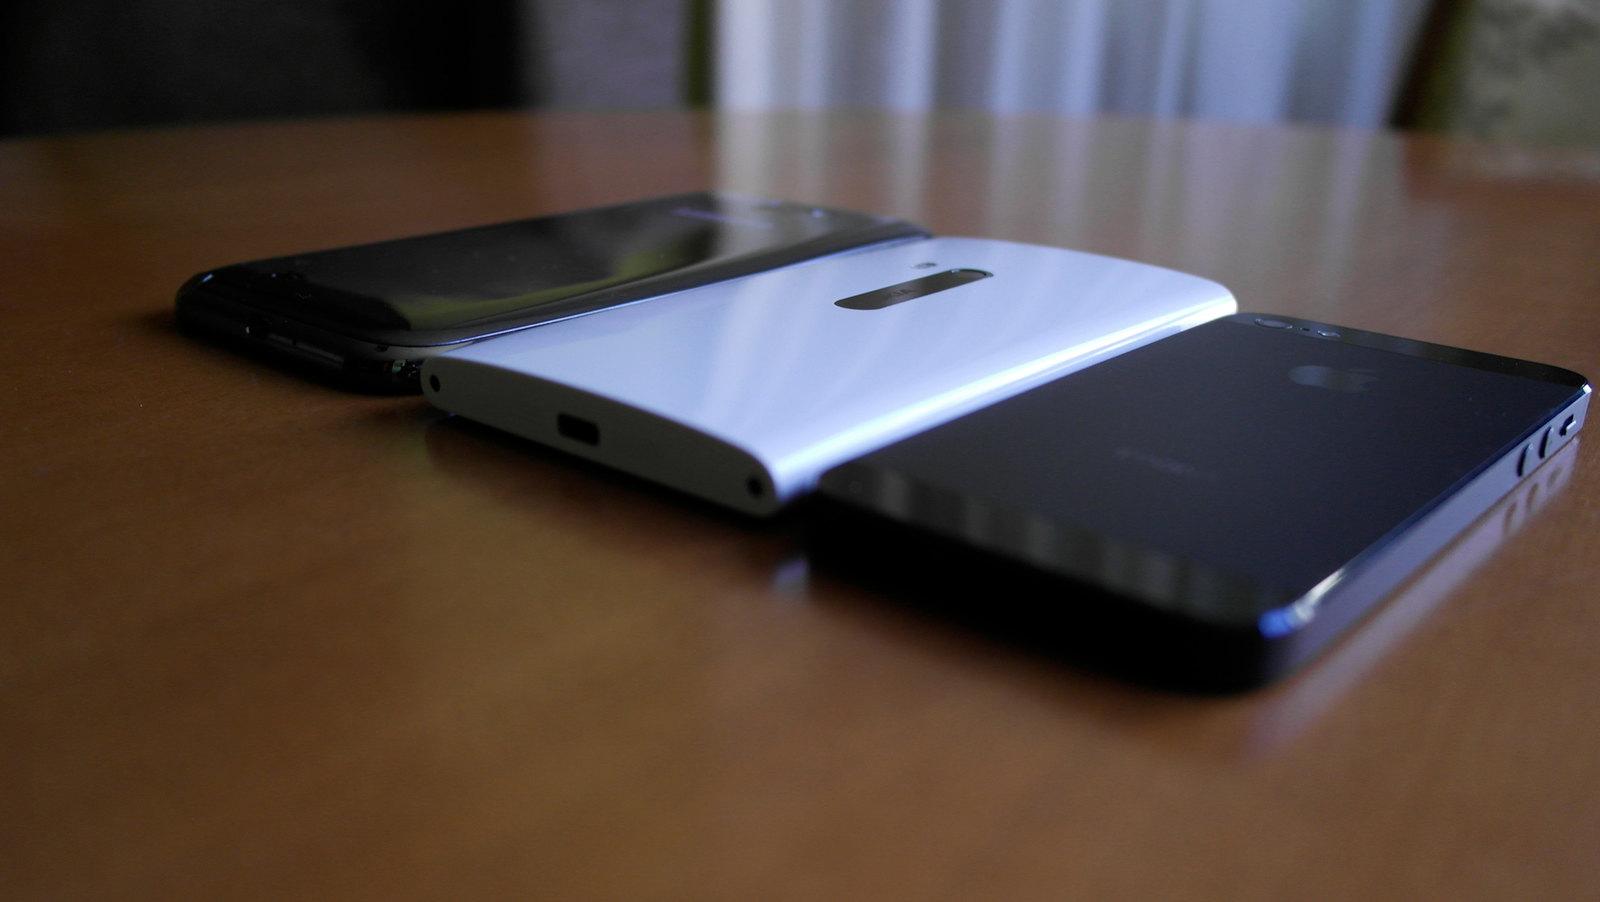 [REVIEW] Duelo de Titanes: Lumia 920 vs iPhone 5 vs Galaxy Note 2